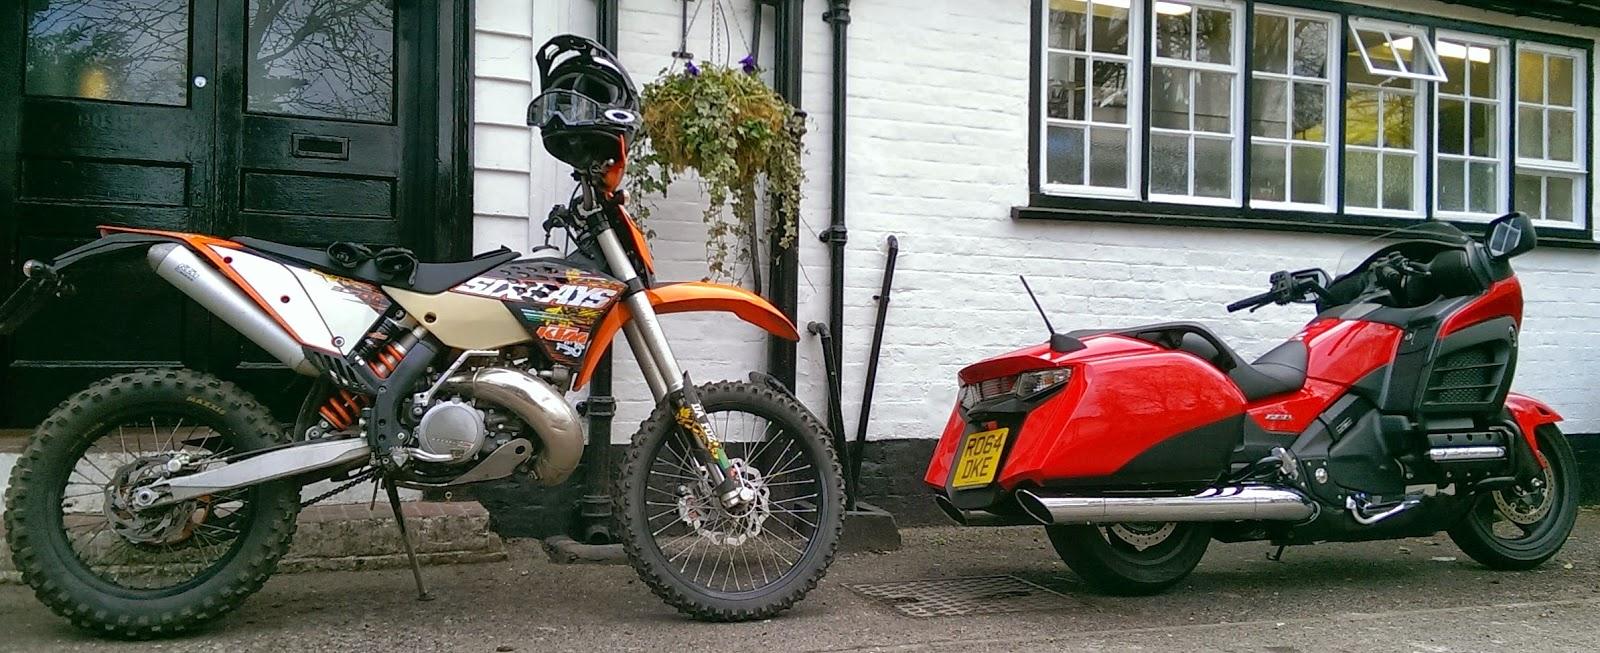 Motorcycle Green Lanes Surrey